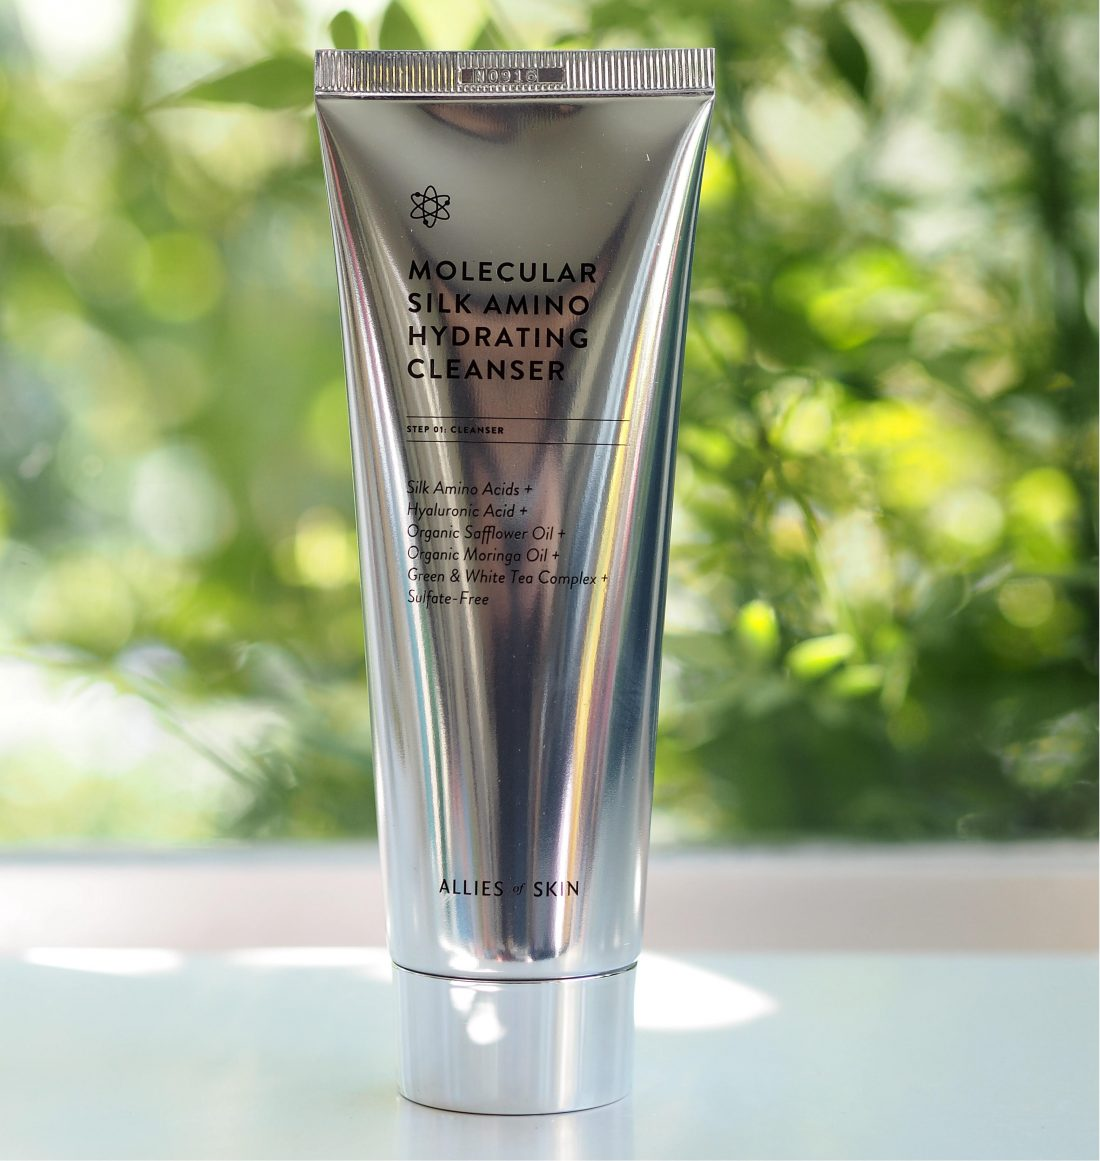 Aliados da pele Molecular Silk Amino Hidratante de limpeza 3